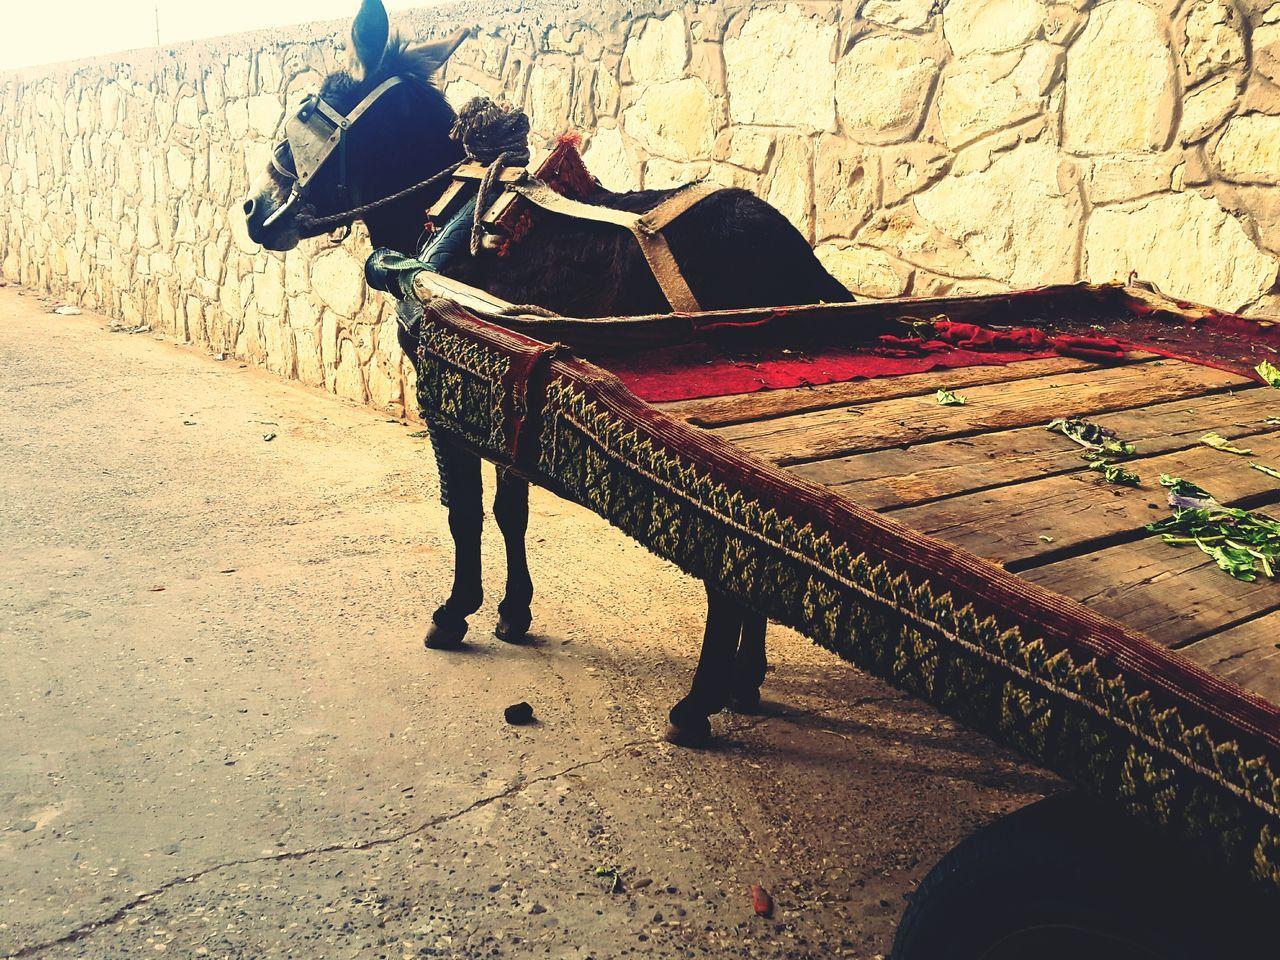 Morocco 🇲🇦 مسجد Donkey Samsung Galaxy S5 Samsungphotography Agadir Morocco Wallpaper Pets One Animal Animal Themes Domestic Animals Traditional Marketplace